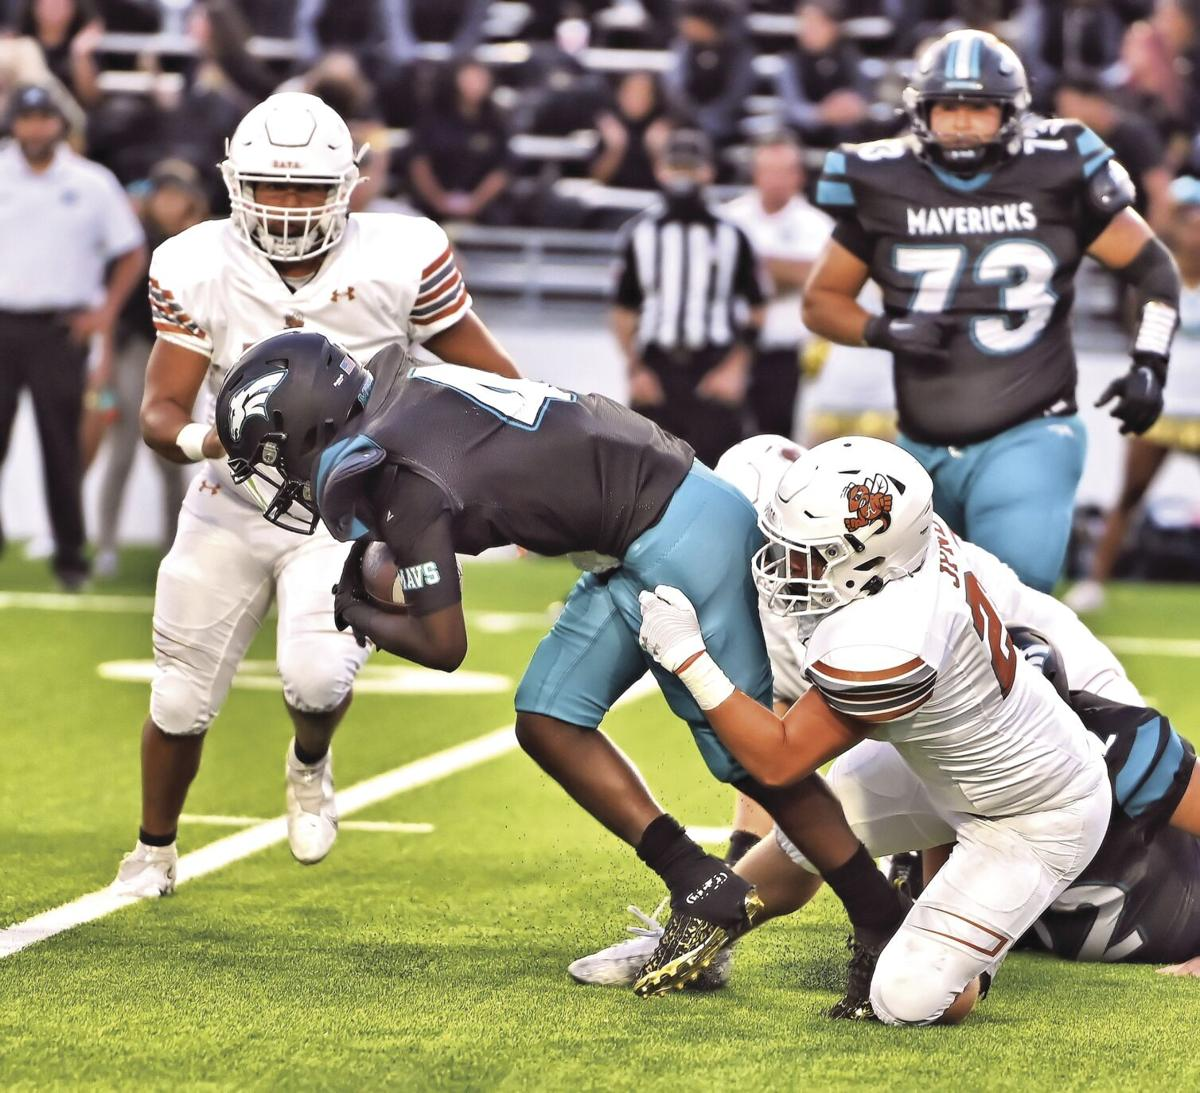 Gage Johnson tackle vs. Memorial